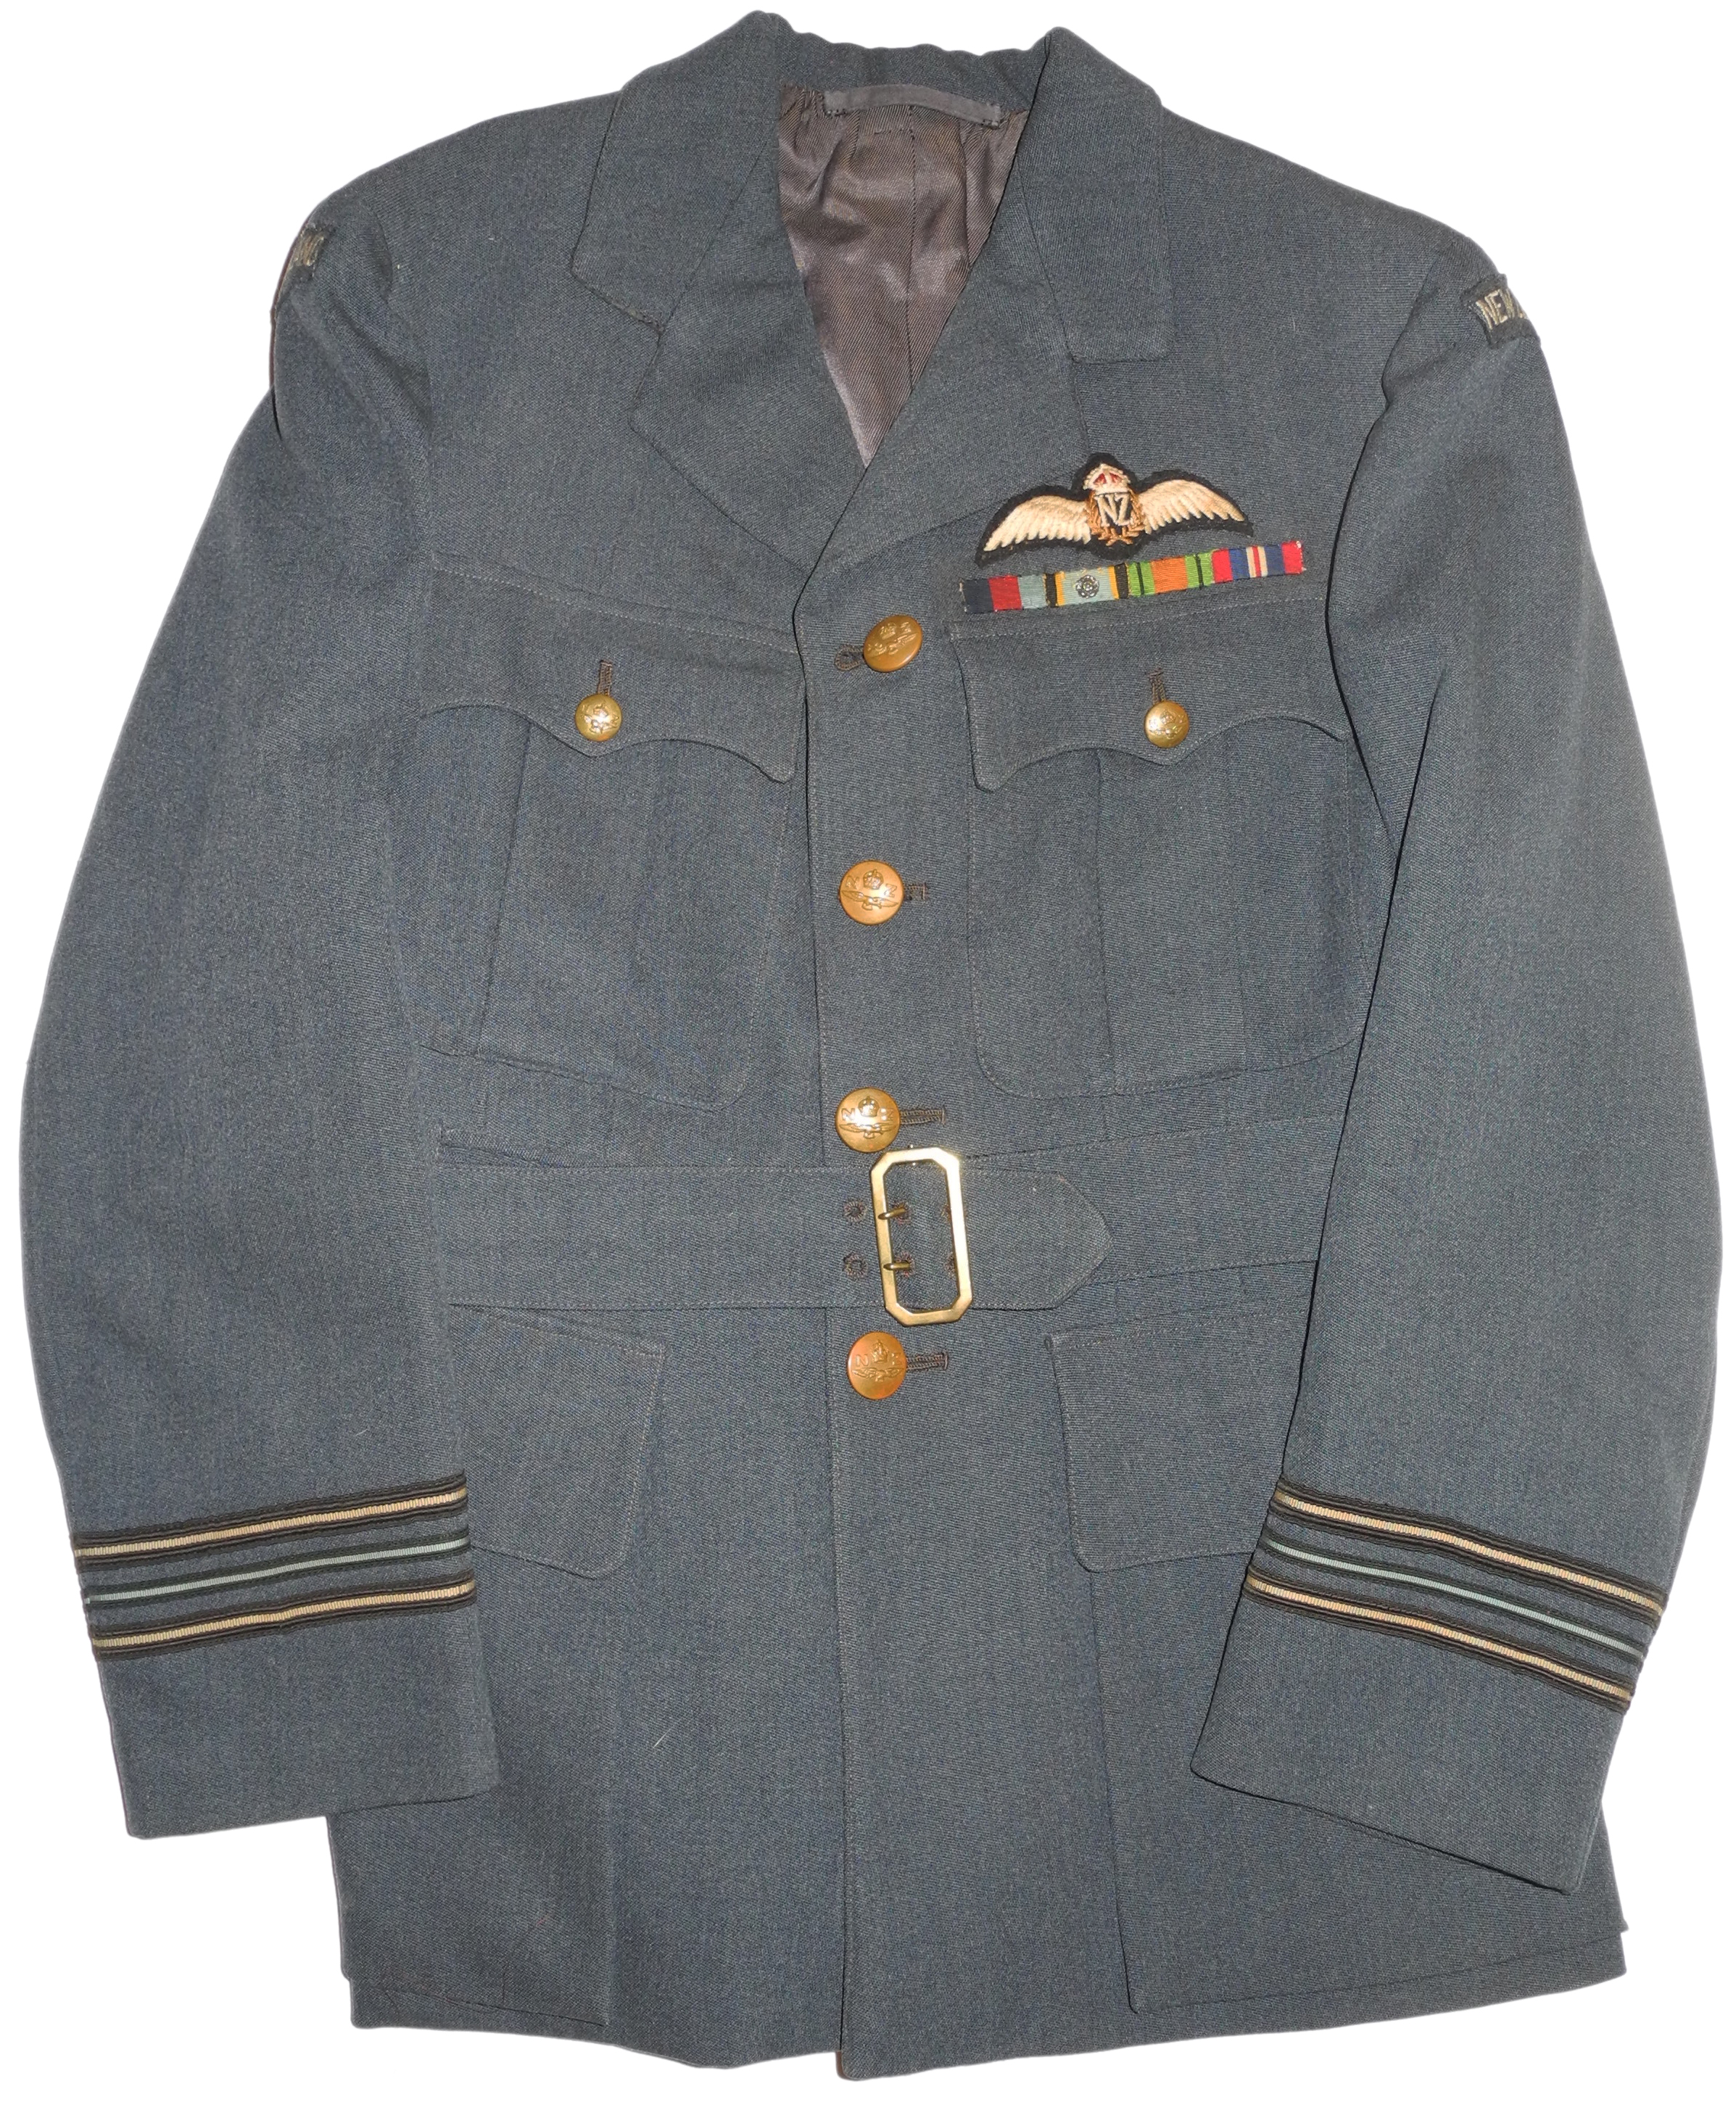 RNZAF officer's SD tunicN4640